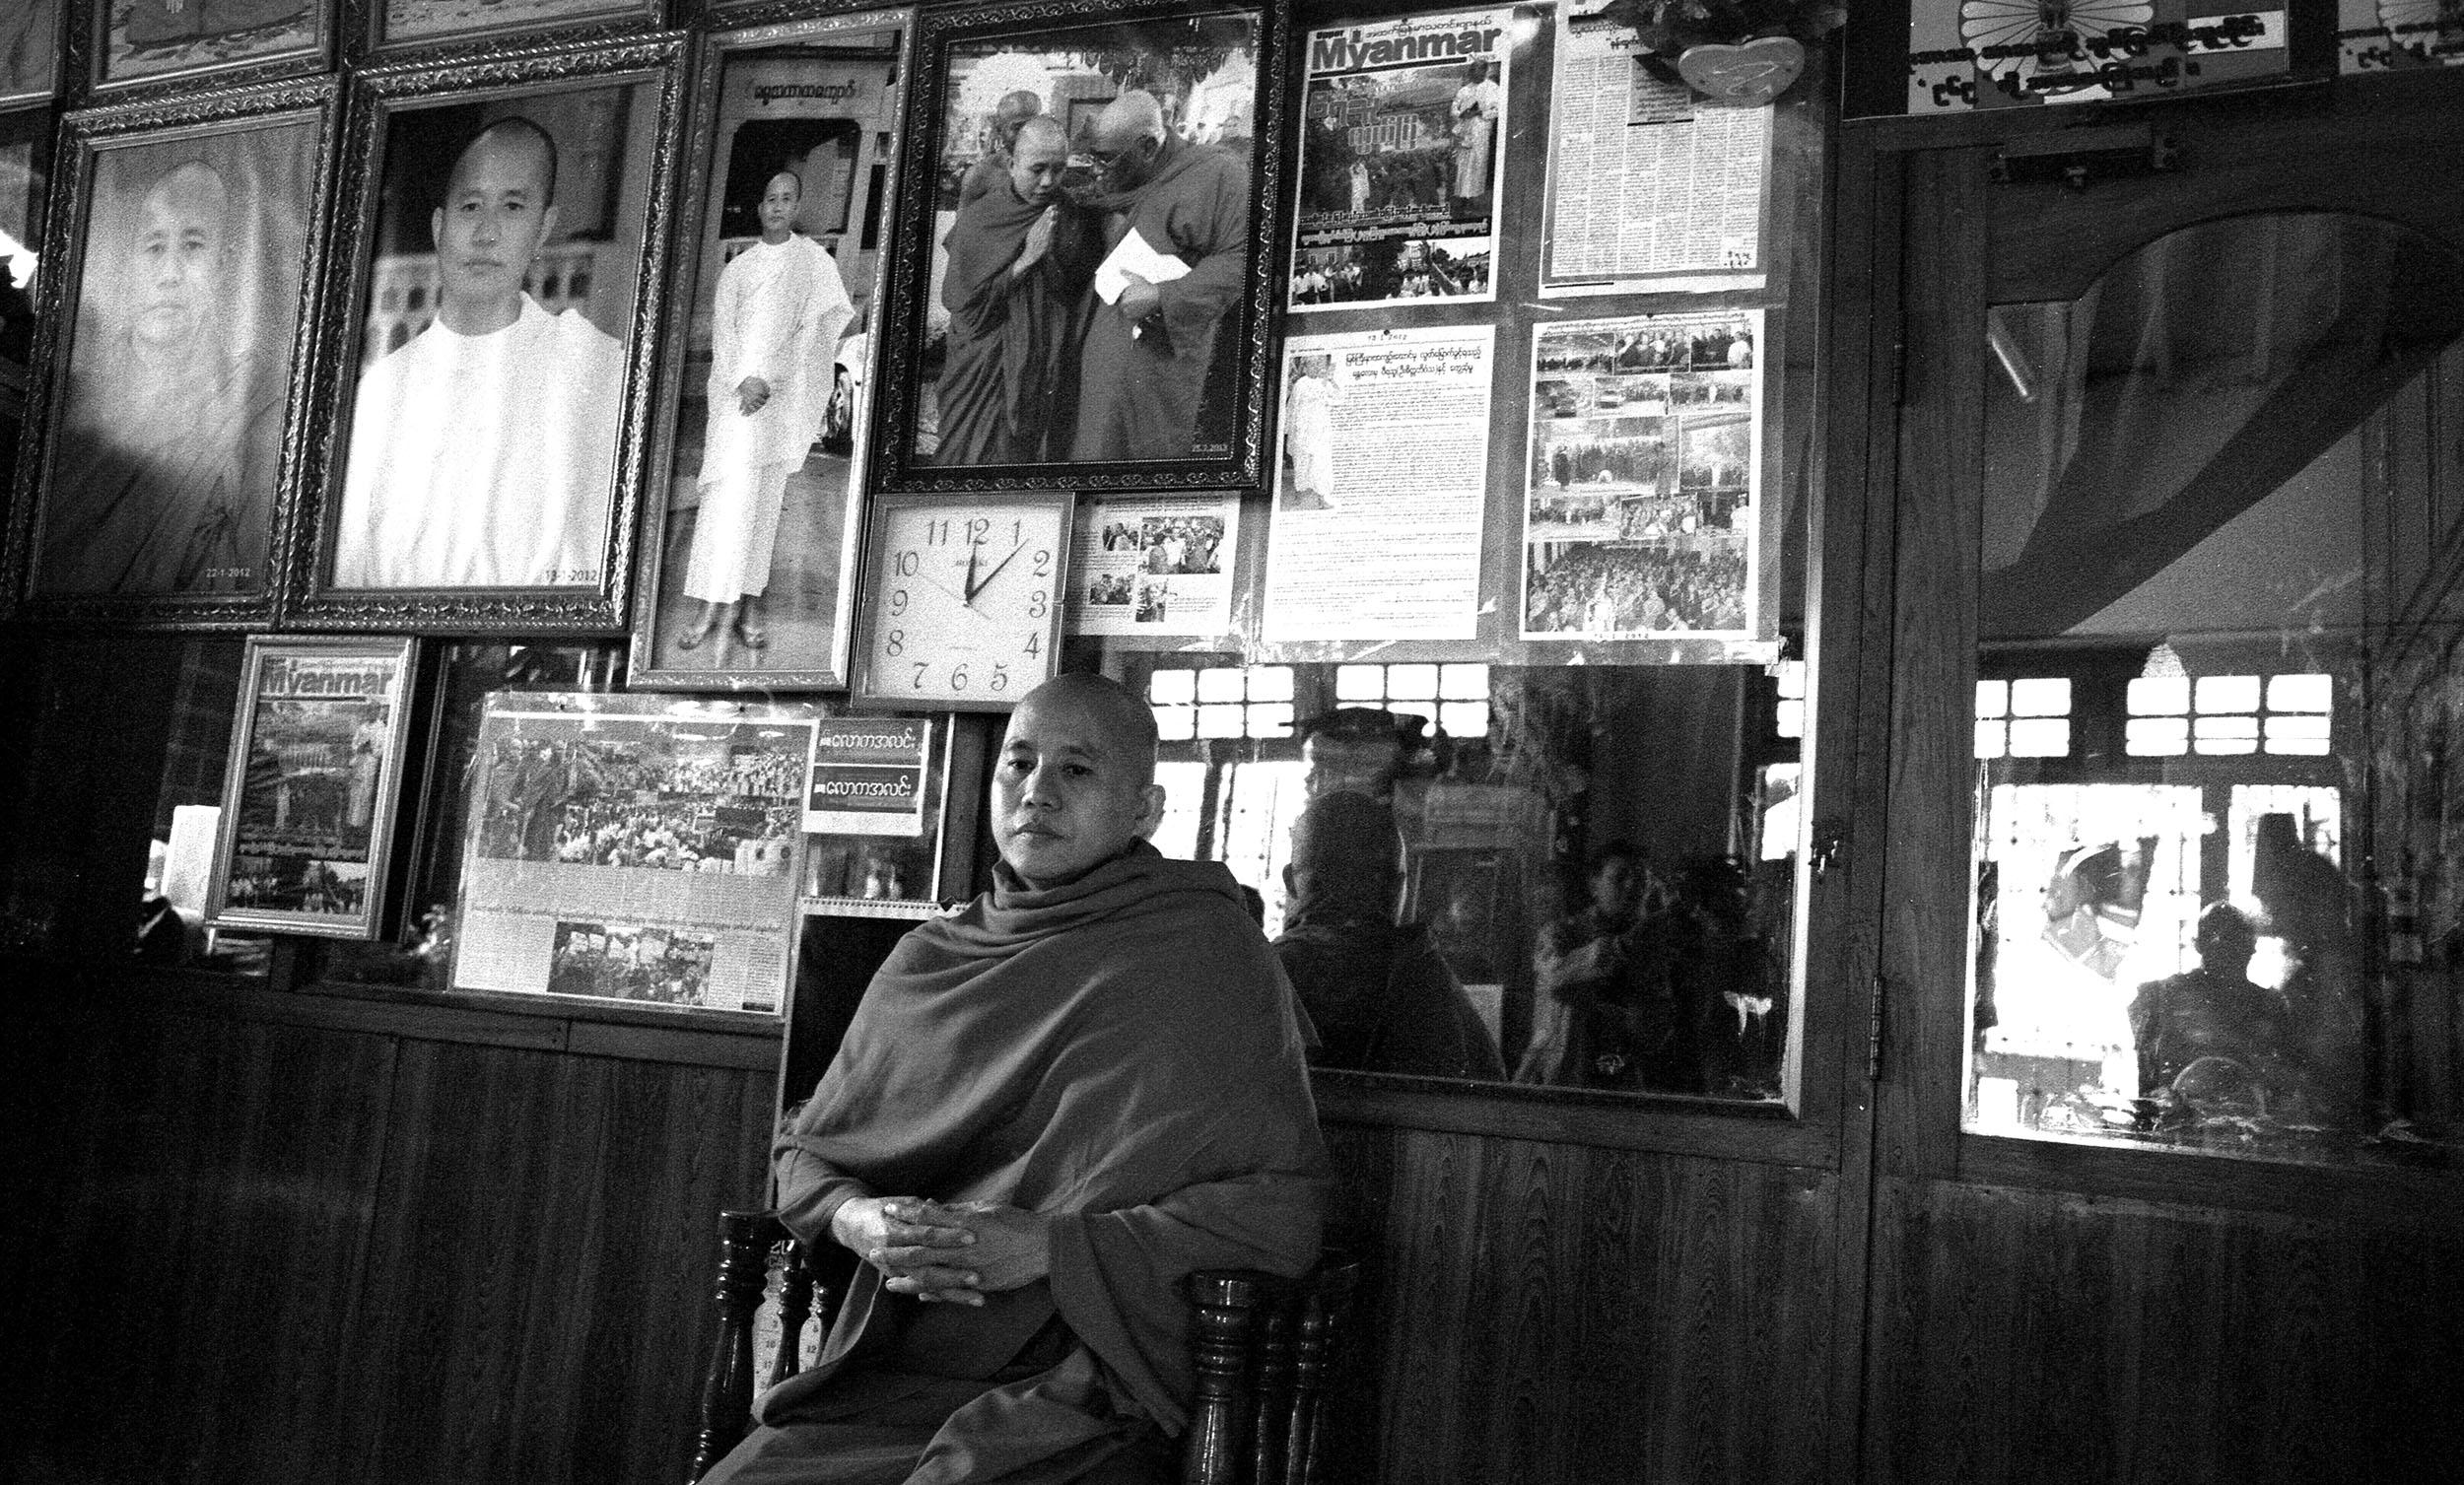 Ashin Wirathu, the figurehead of the fascist Buddhist 969 movement at his monestary in Mandalay.